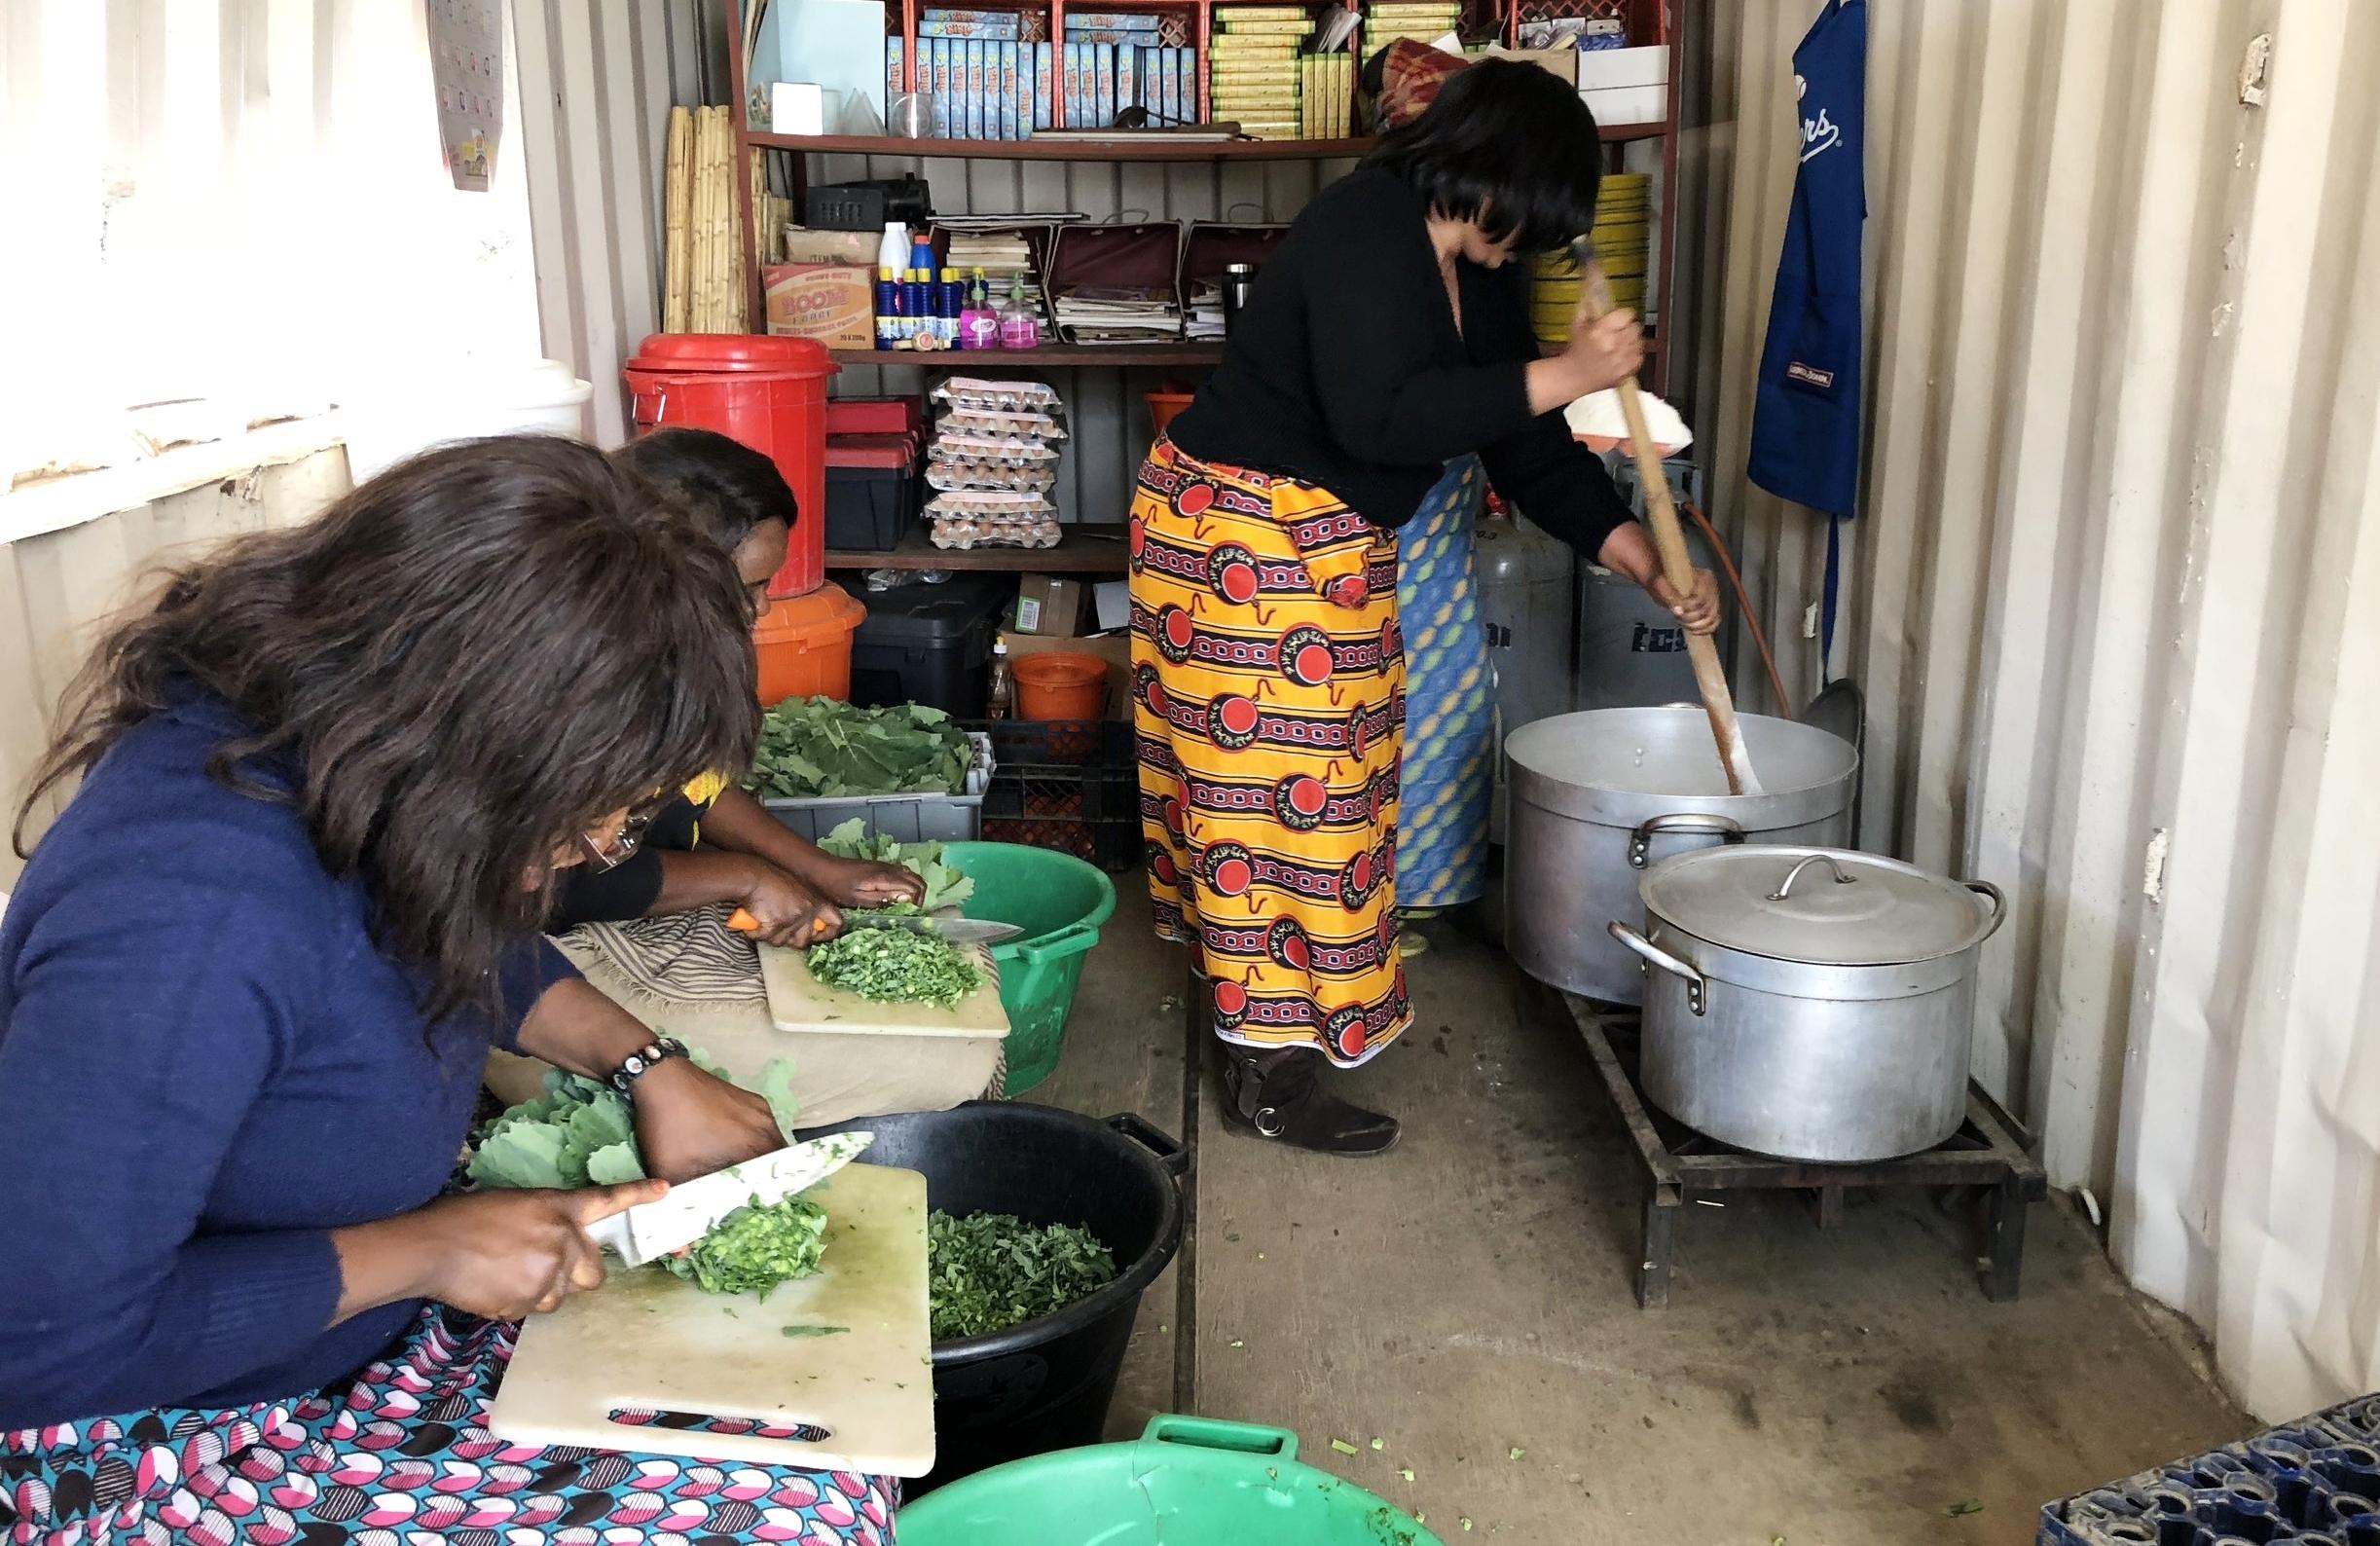 Dotroda Staffers preparing for lunch